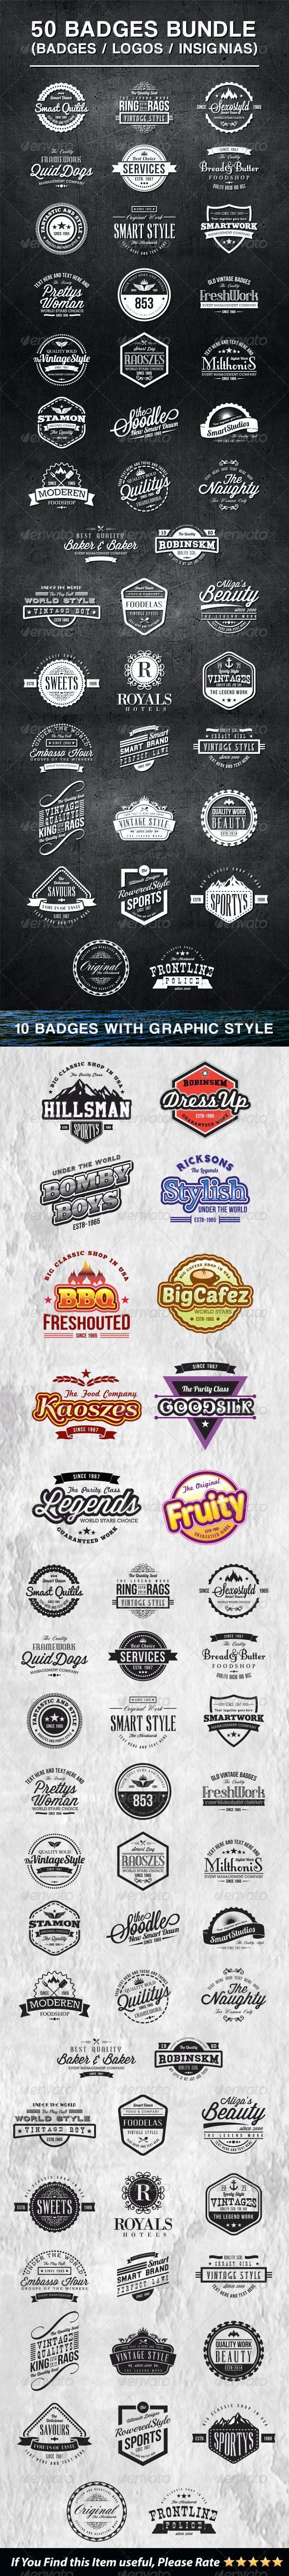 50 Vintage Style Badges Bundle - Badges & Stickers Web Elements